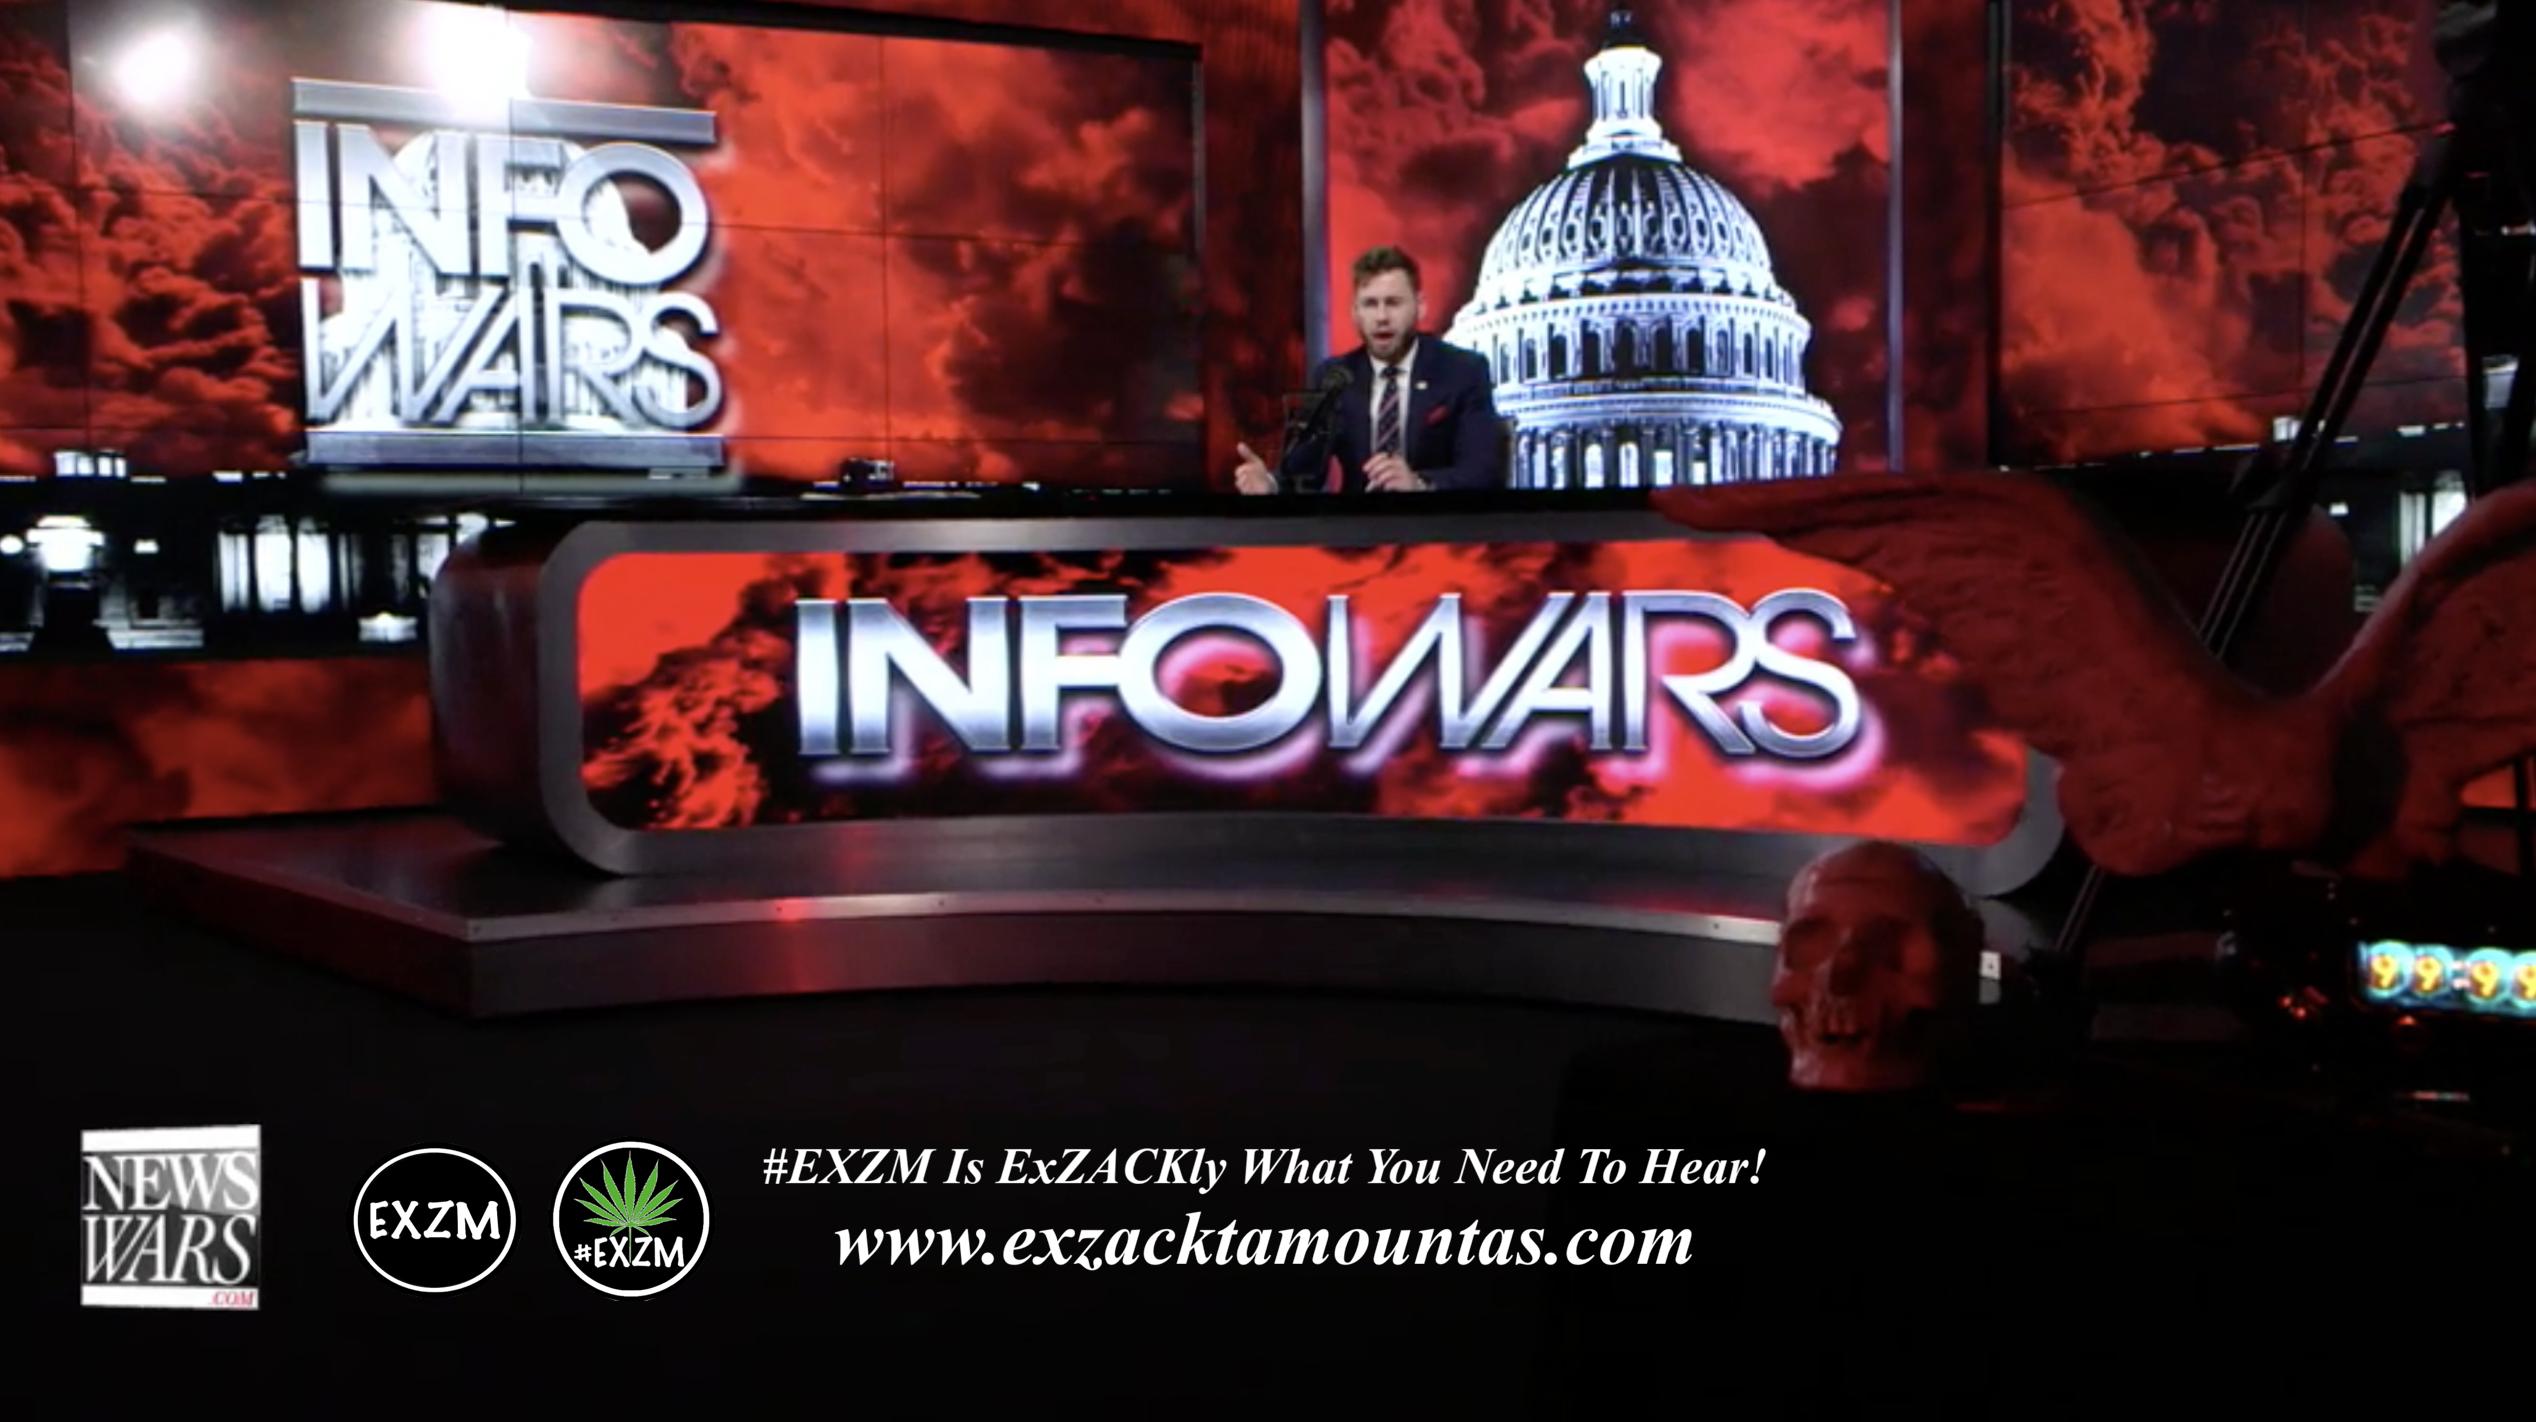 Owen Shroyer Live In Infowars Studio Human Skull Angel Wings EXZM Zack Mount May 20th 2021 copy